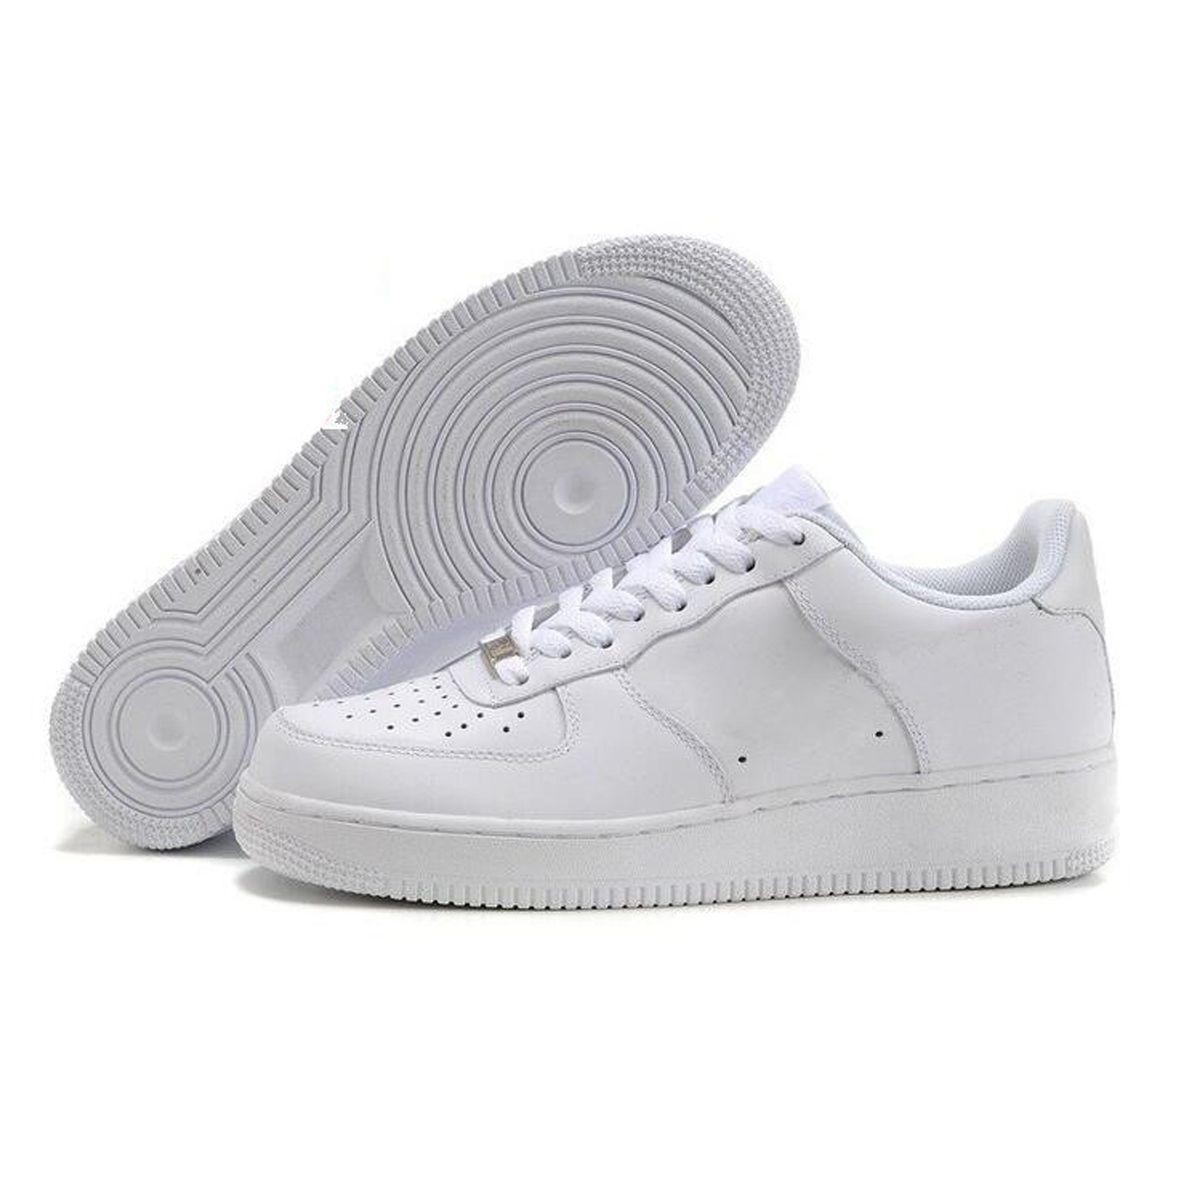 bae4c6eeb479b0 2019 Hot Sales One 1 Dunk Men Women Flyline Running Shoes Sports ...